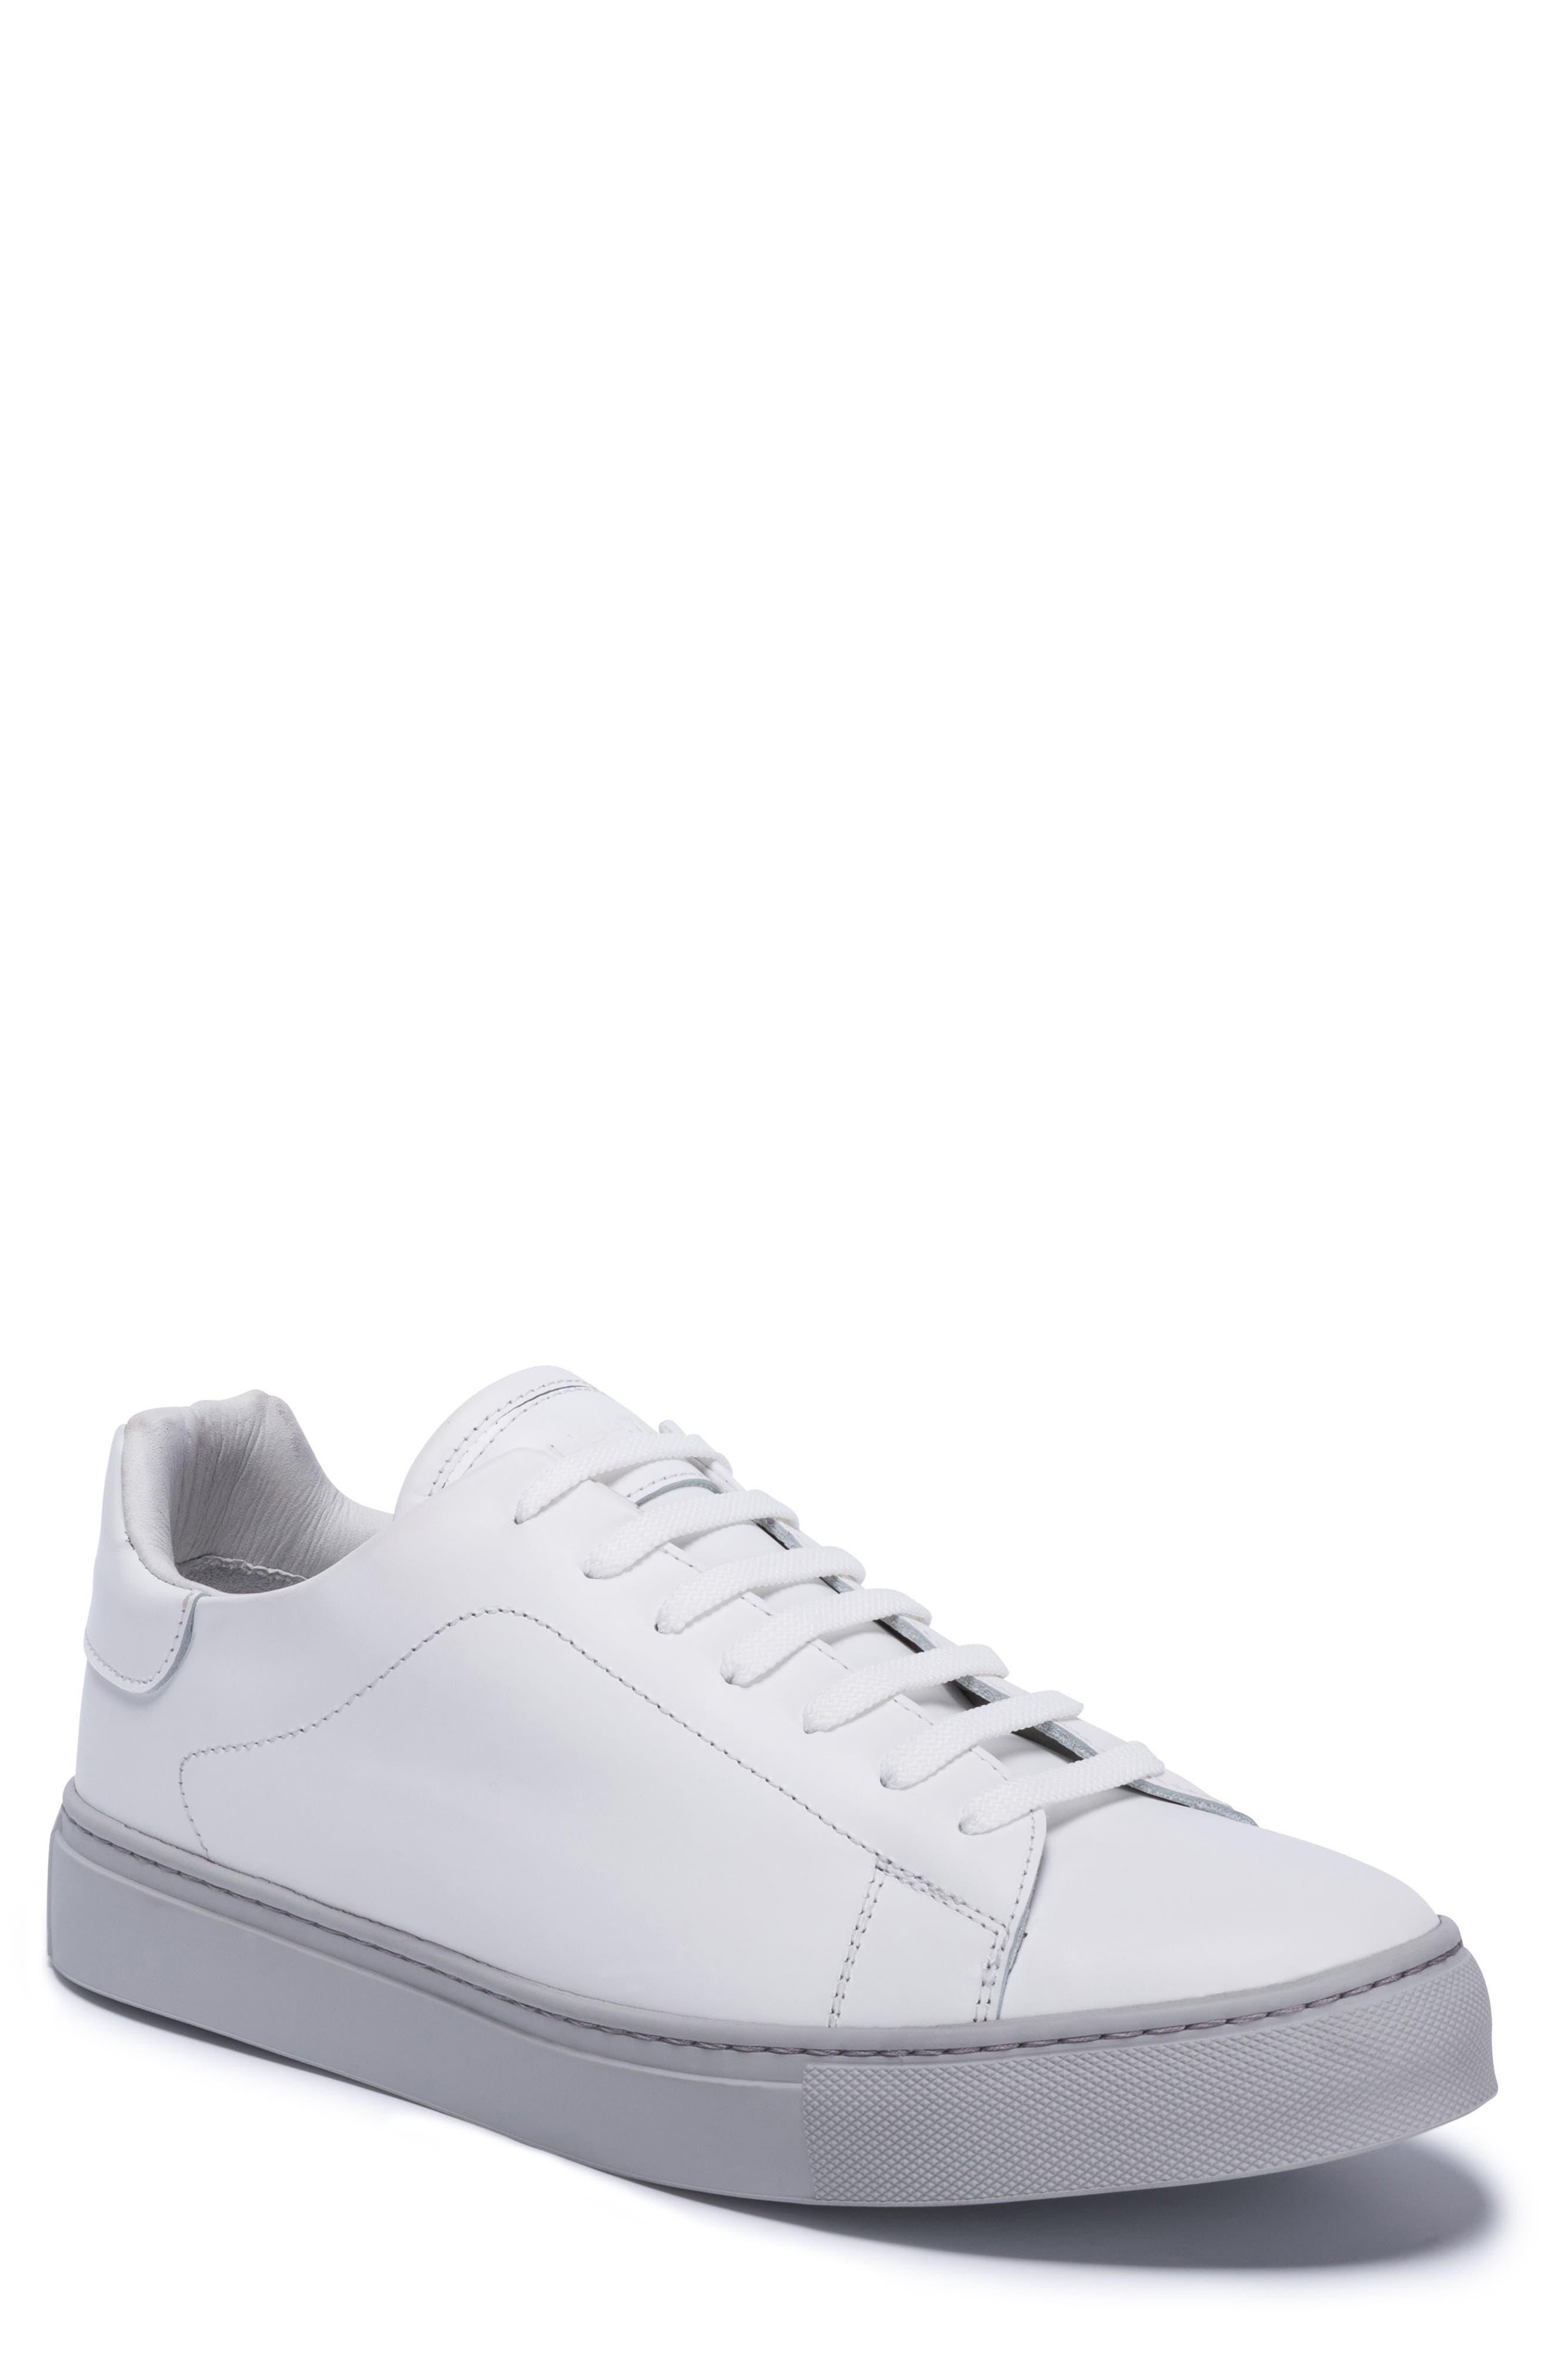 Massa Sneaker,                             Main thumbnail 1, color,                             BIANCO LEATHER